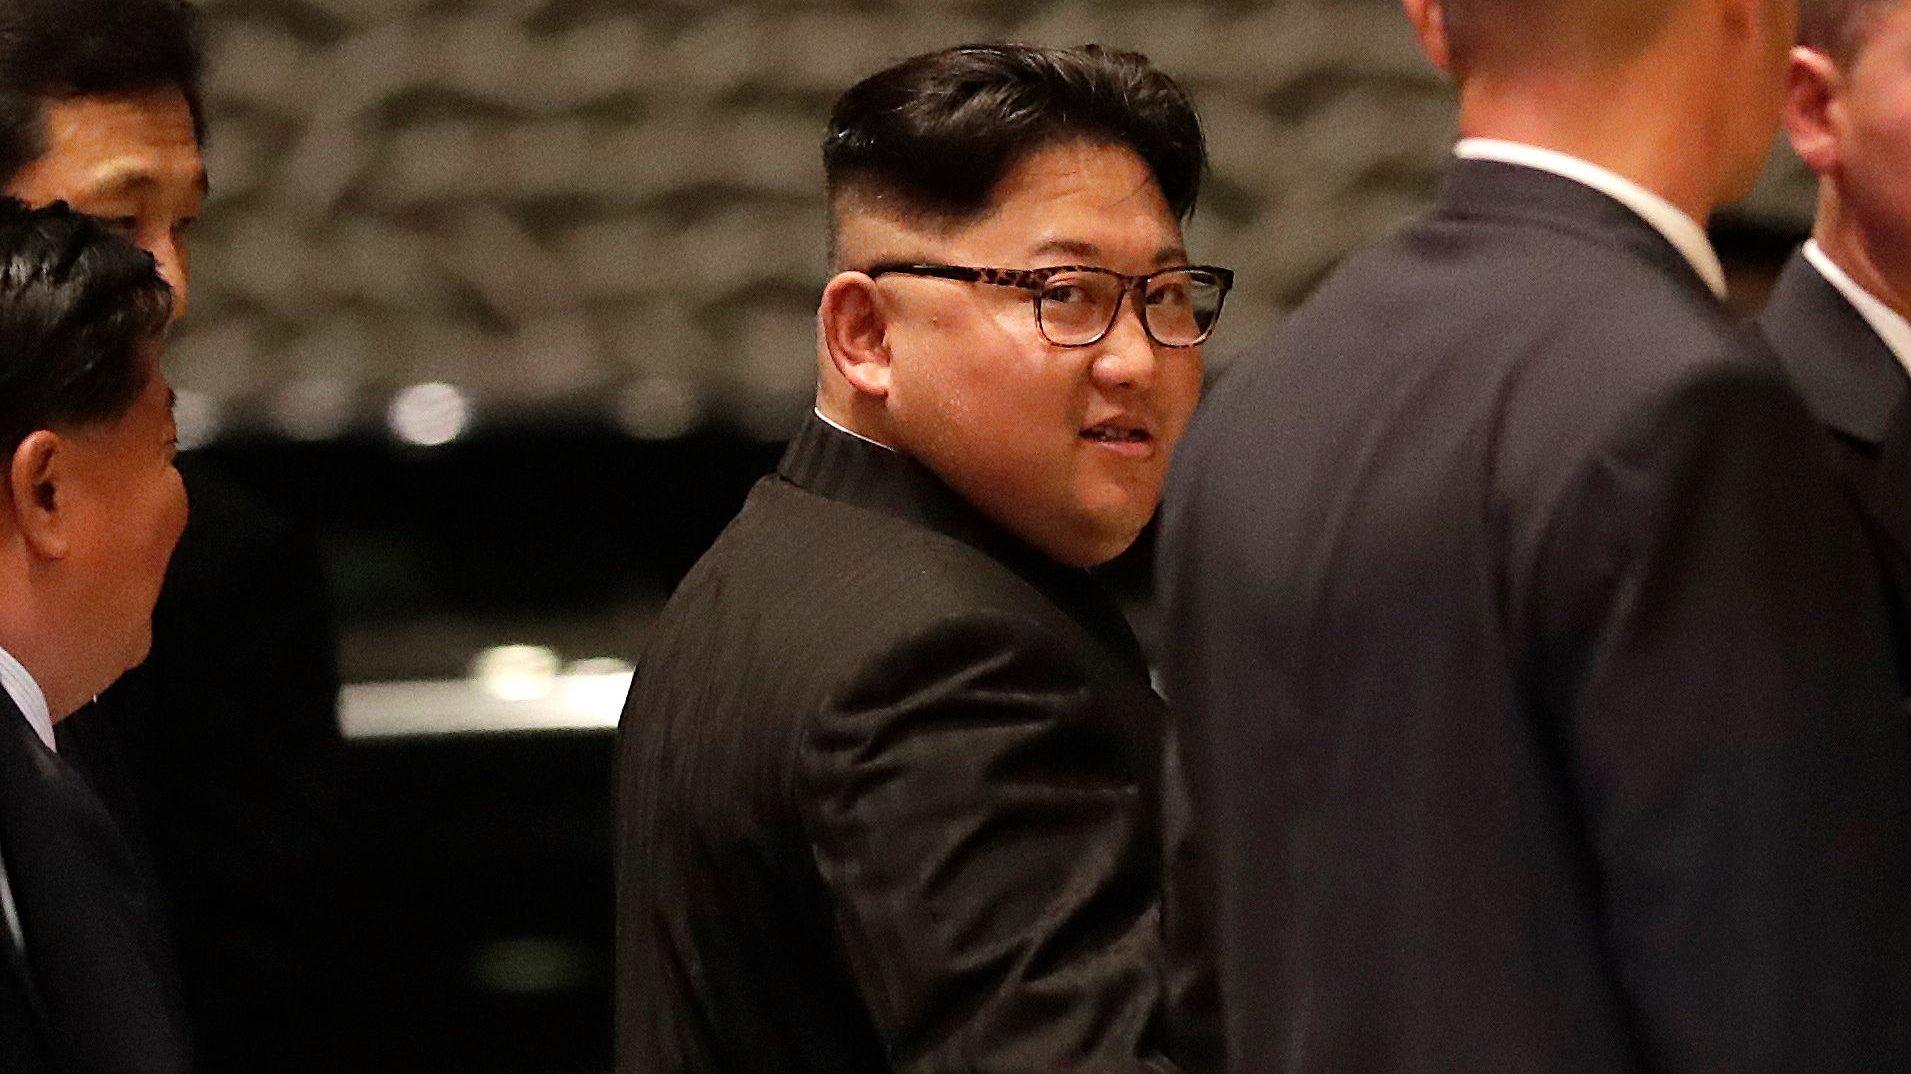 Sheldon Adelson wants to open a casino in North Korea - Quartz